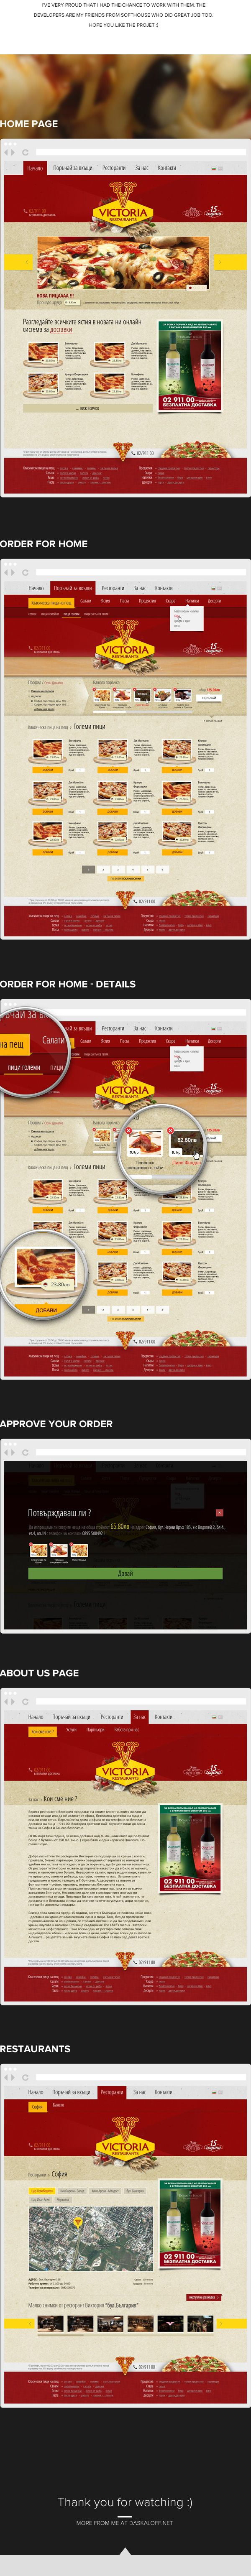 '13 - Pizza Victoria by Stoyan Daskaloff, via Behance